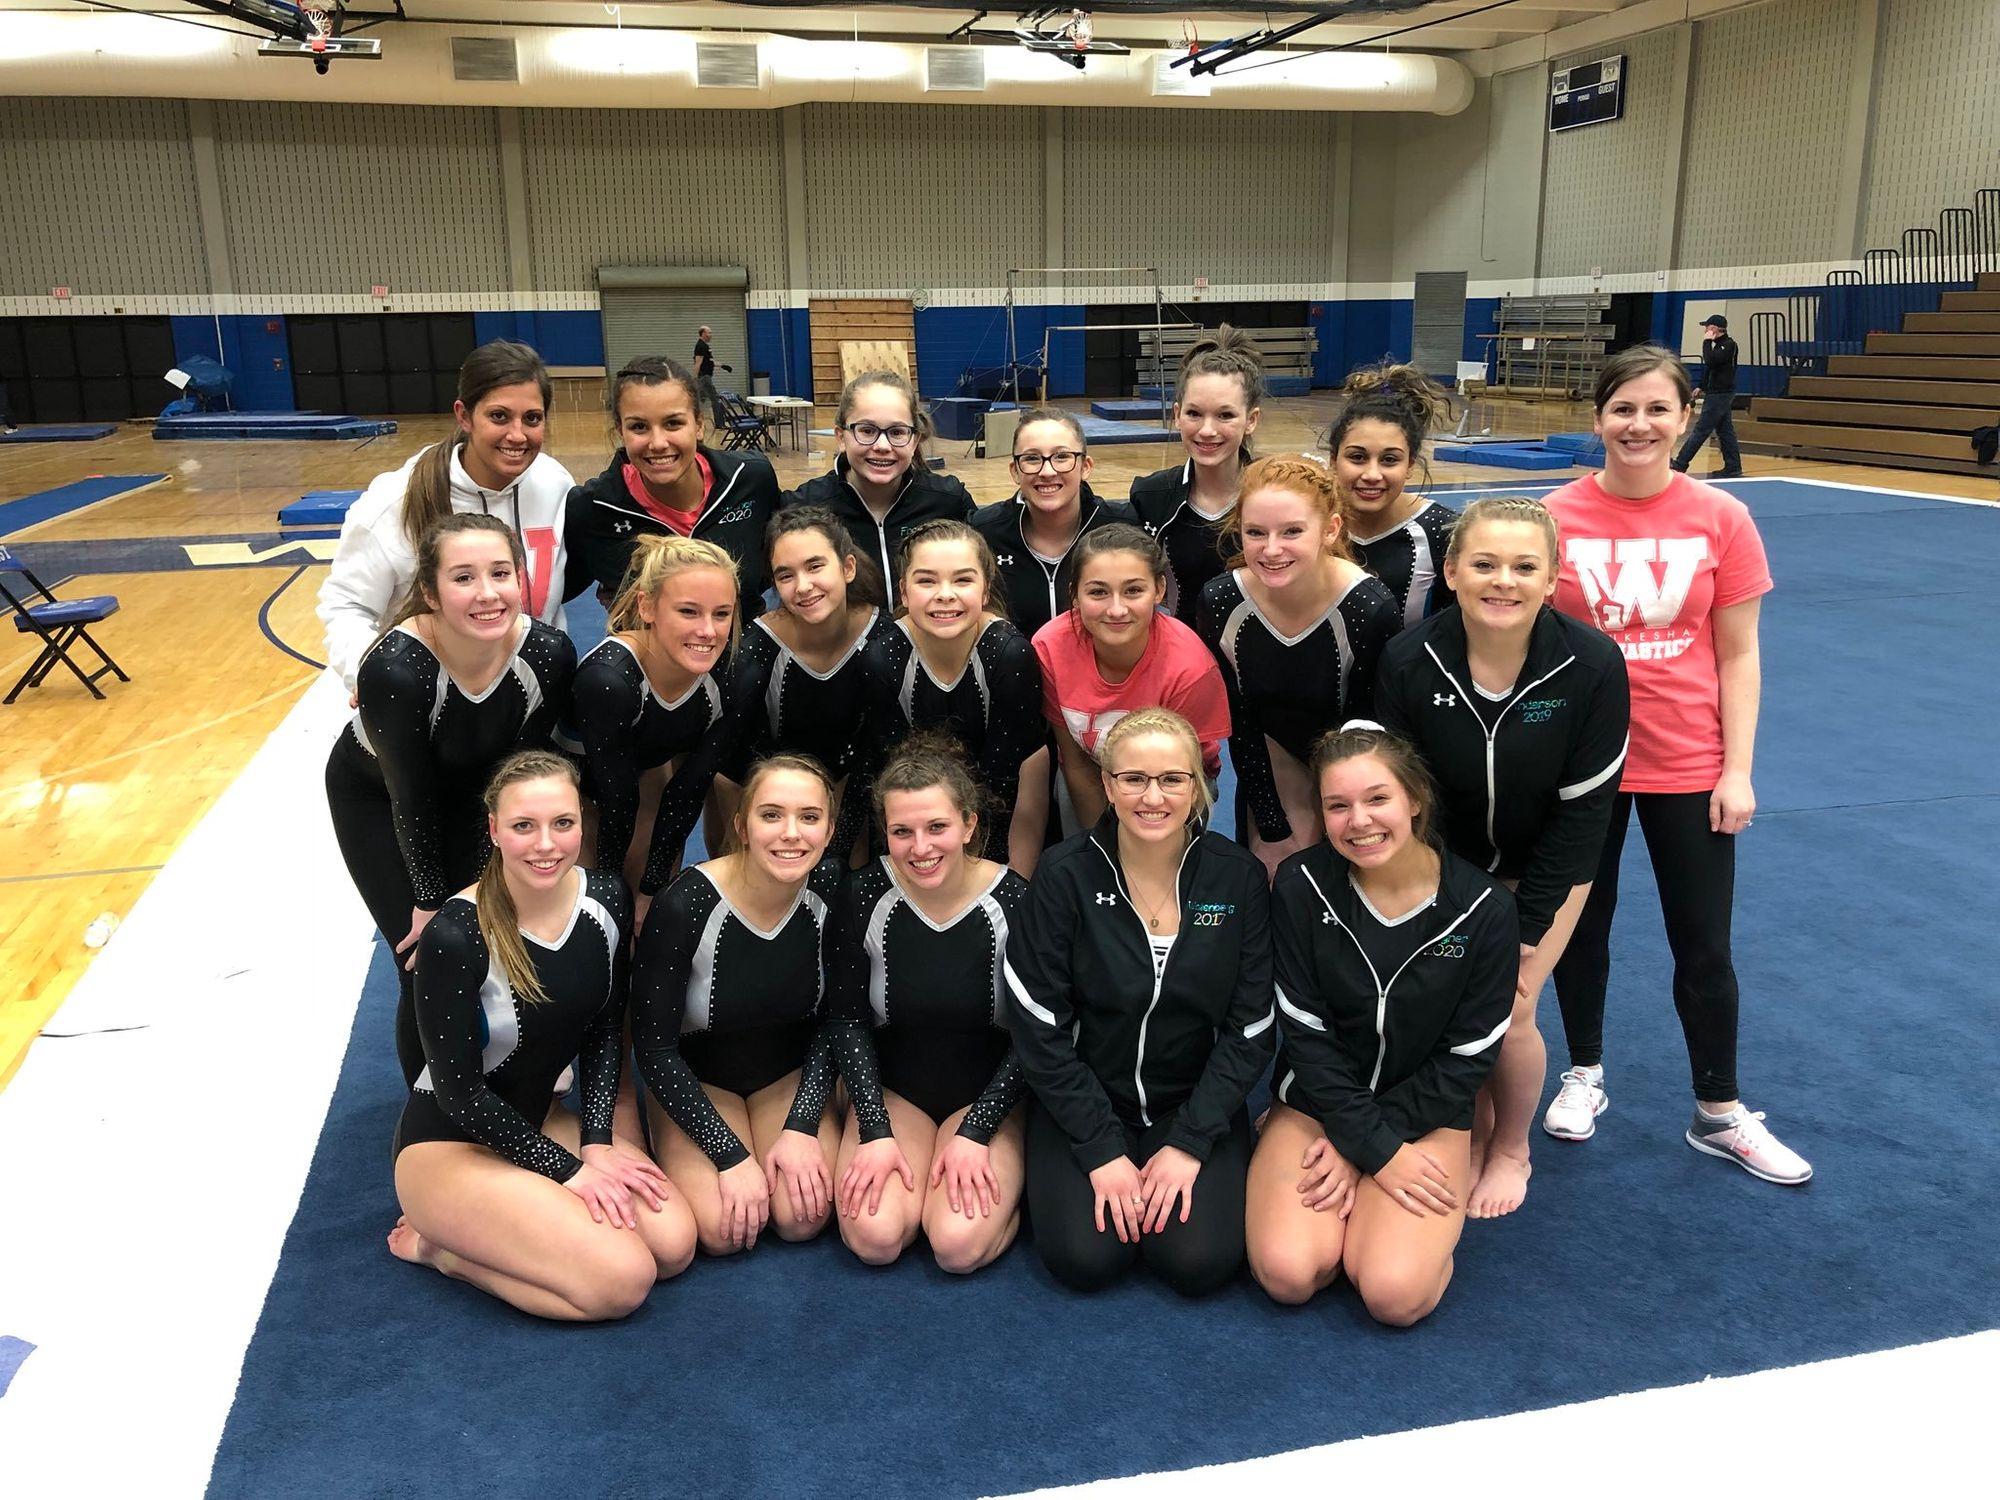 Waukesha Gymnastics Team Finishes Strong